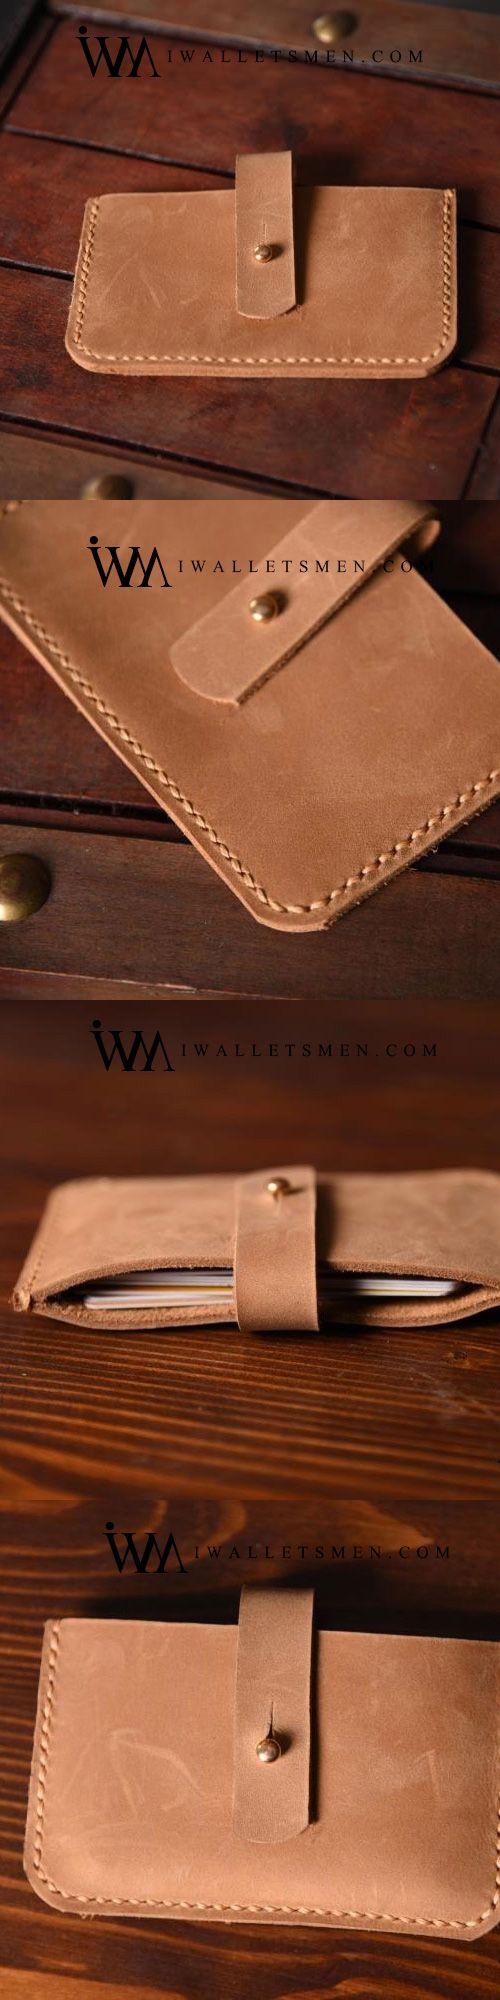 HANDMADE MENS COOL SHORT LEATHER WALLET MEN SMALL CARD SLIM WALLETS BIFOLD FOR MEN